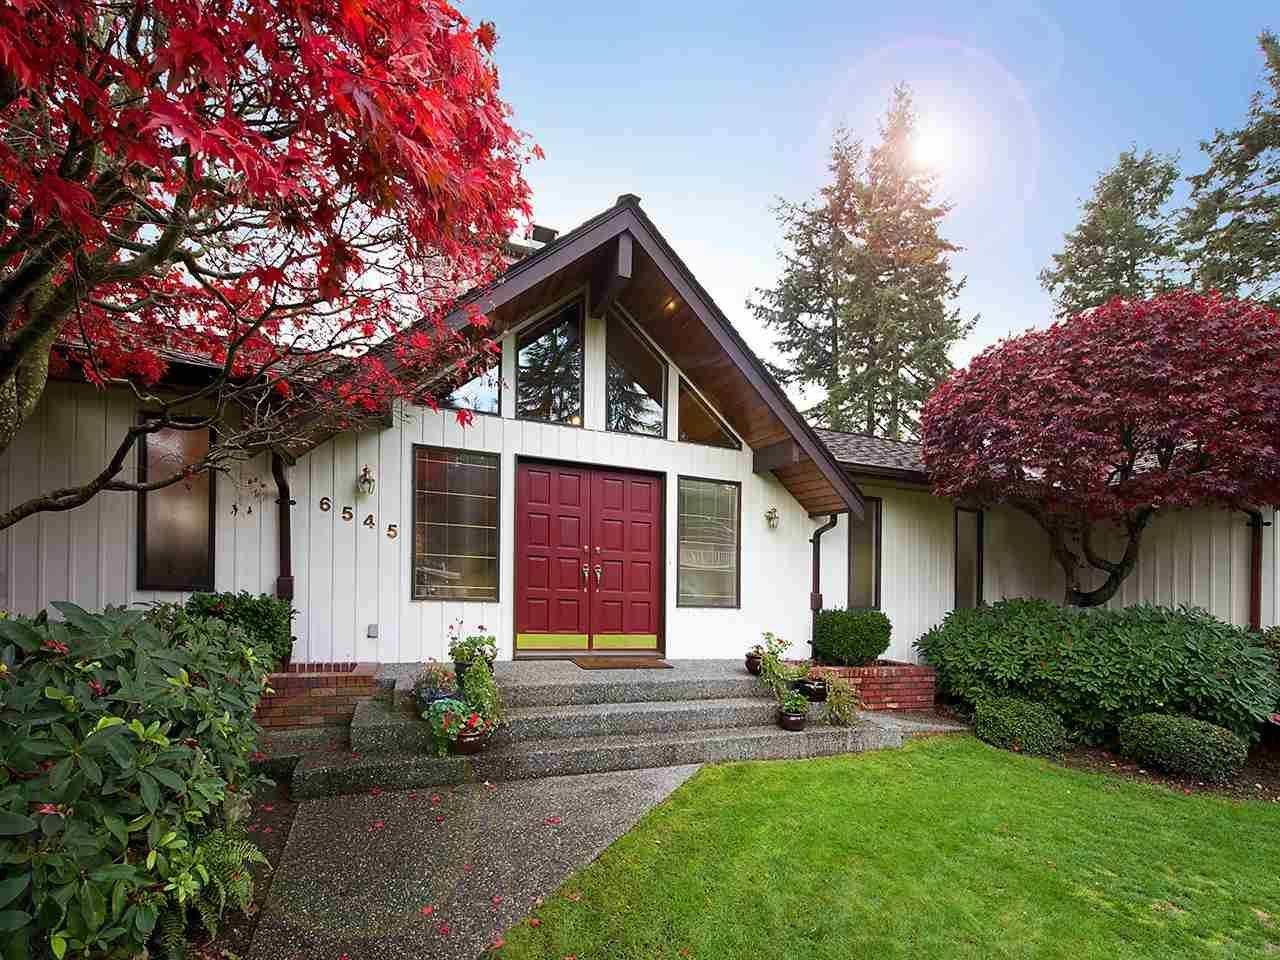 Main Photo: 6545 HILLSIDE CRESCENT in Delta: Sunshine Hills Woods House for sale (N. Delta)  : MLS®# R2014396